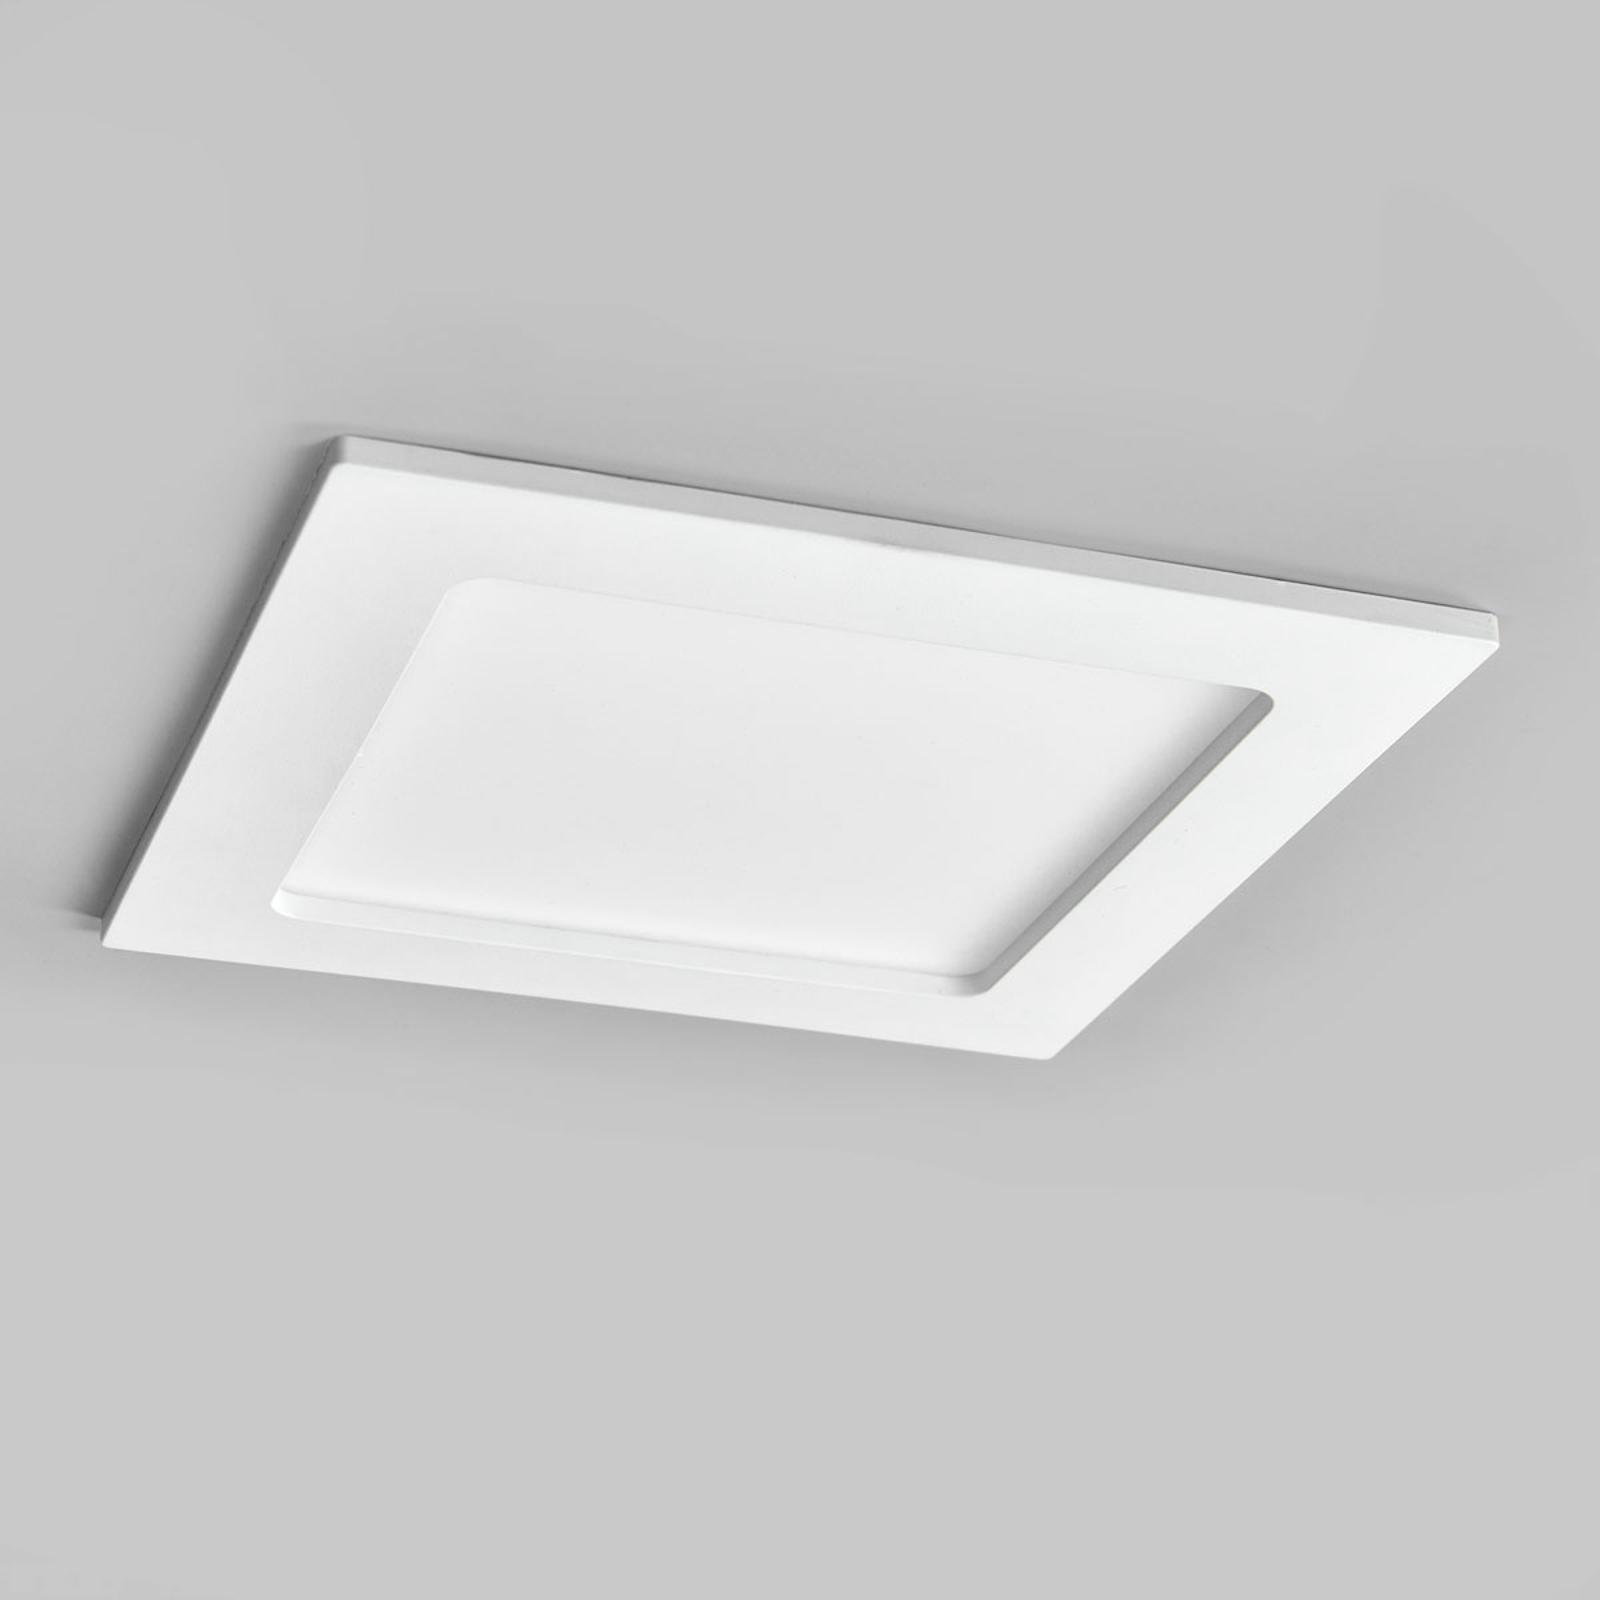 Spot LED Joki blanc 4000K angulaire 16,5cm